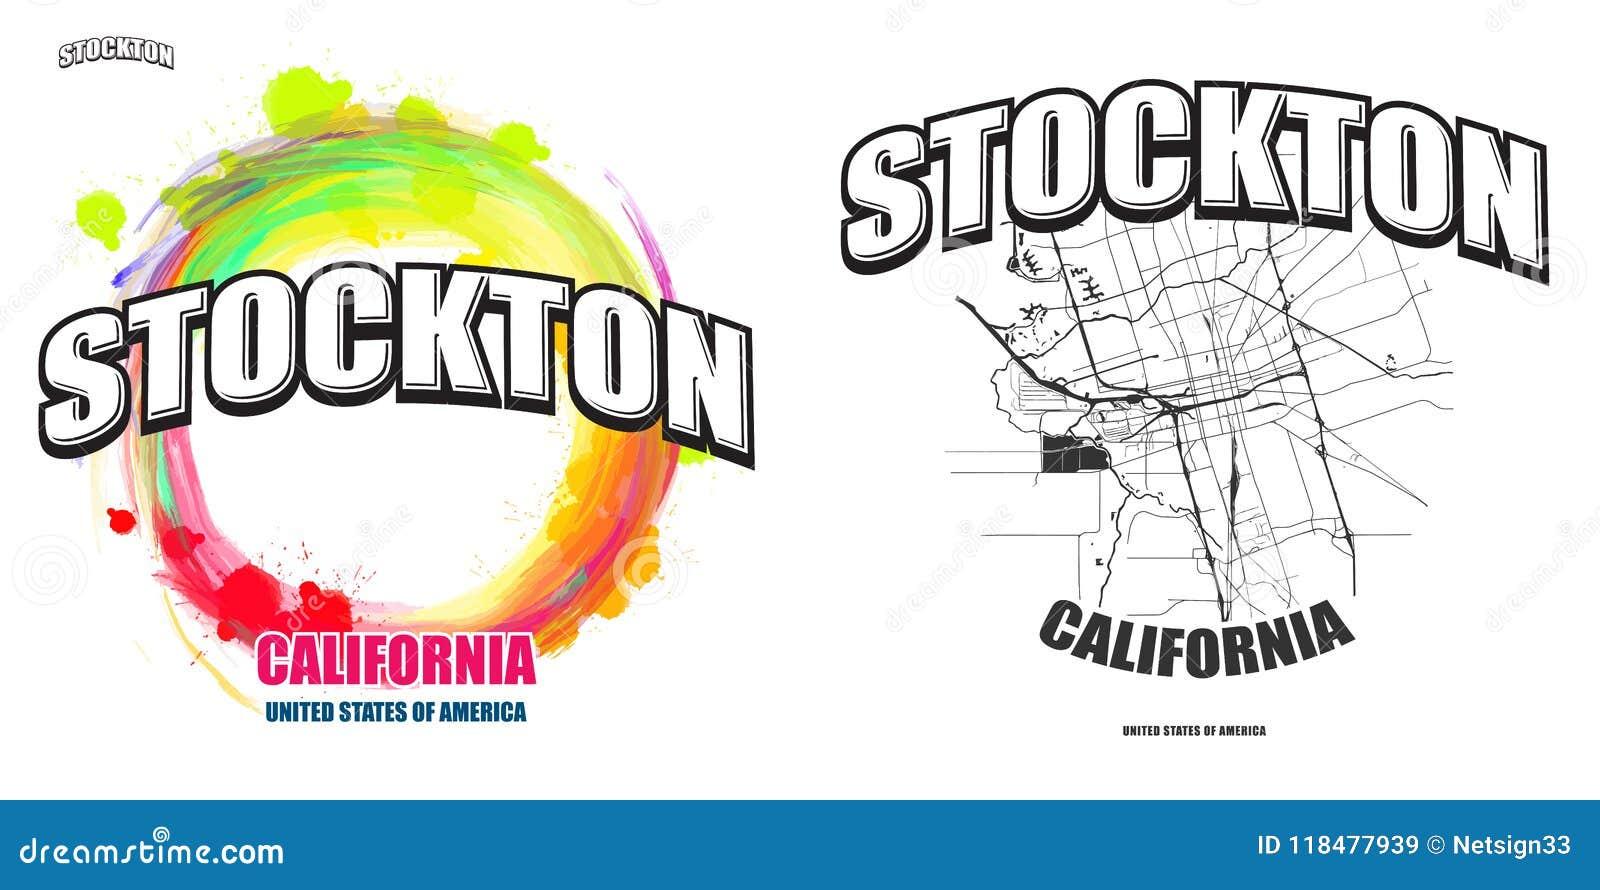 Stockton, California, Two Logo Artworks Stock Vector - Illustration ...